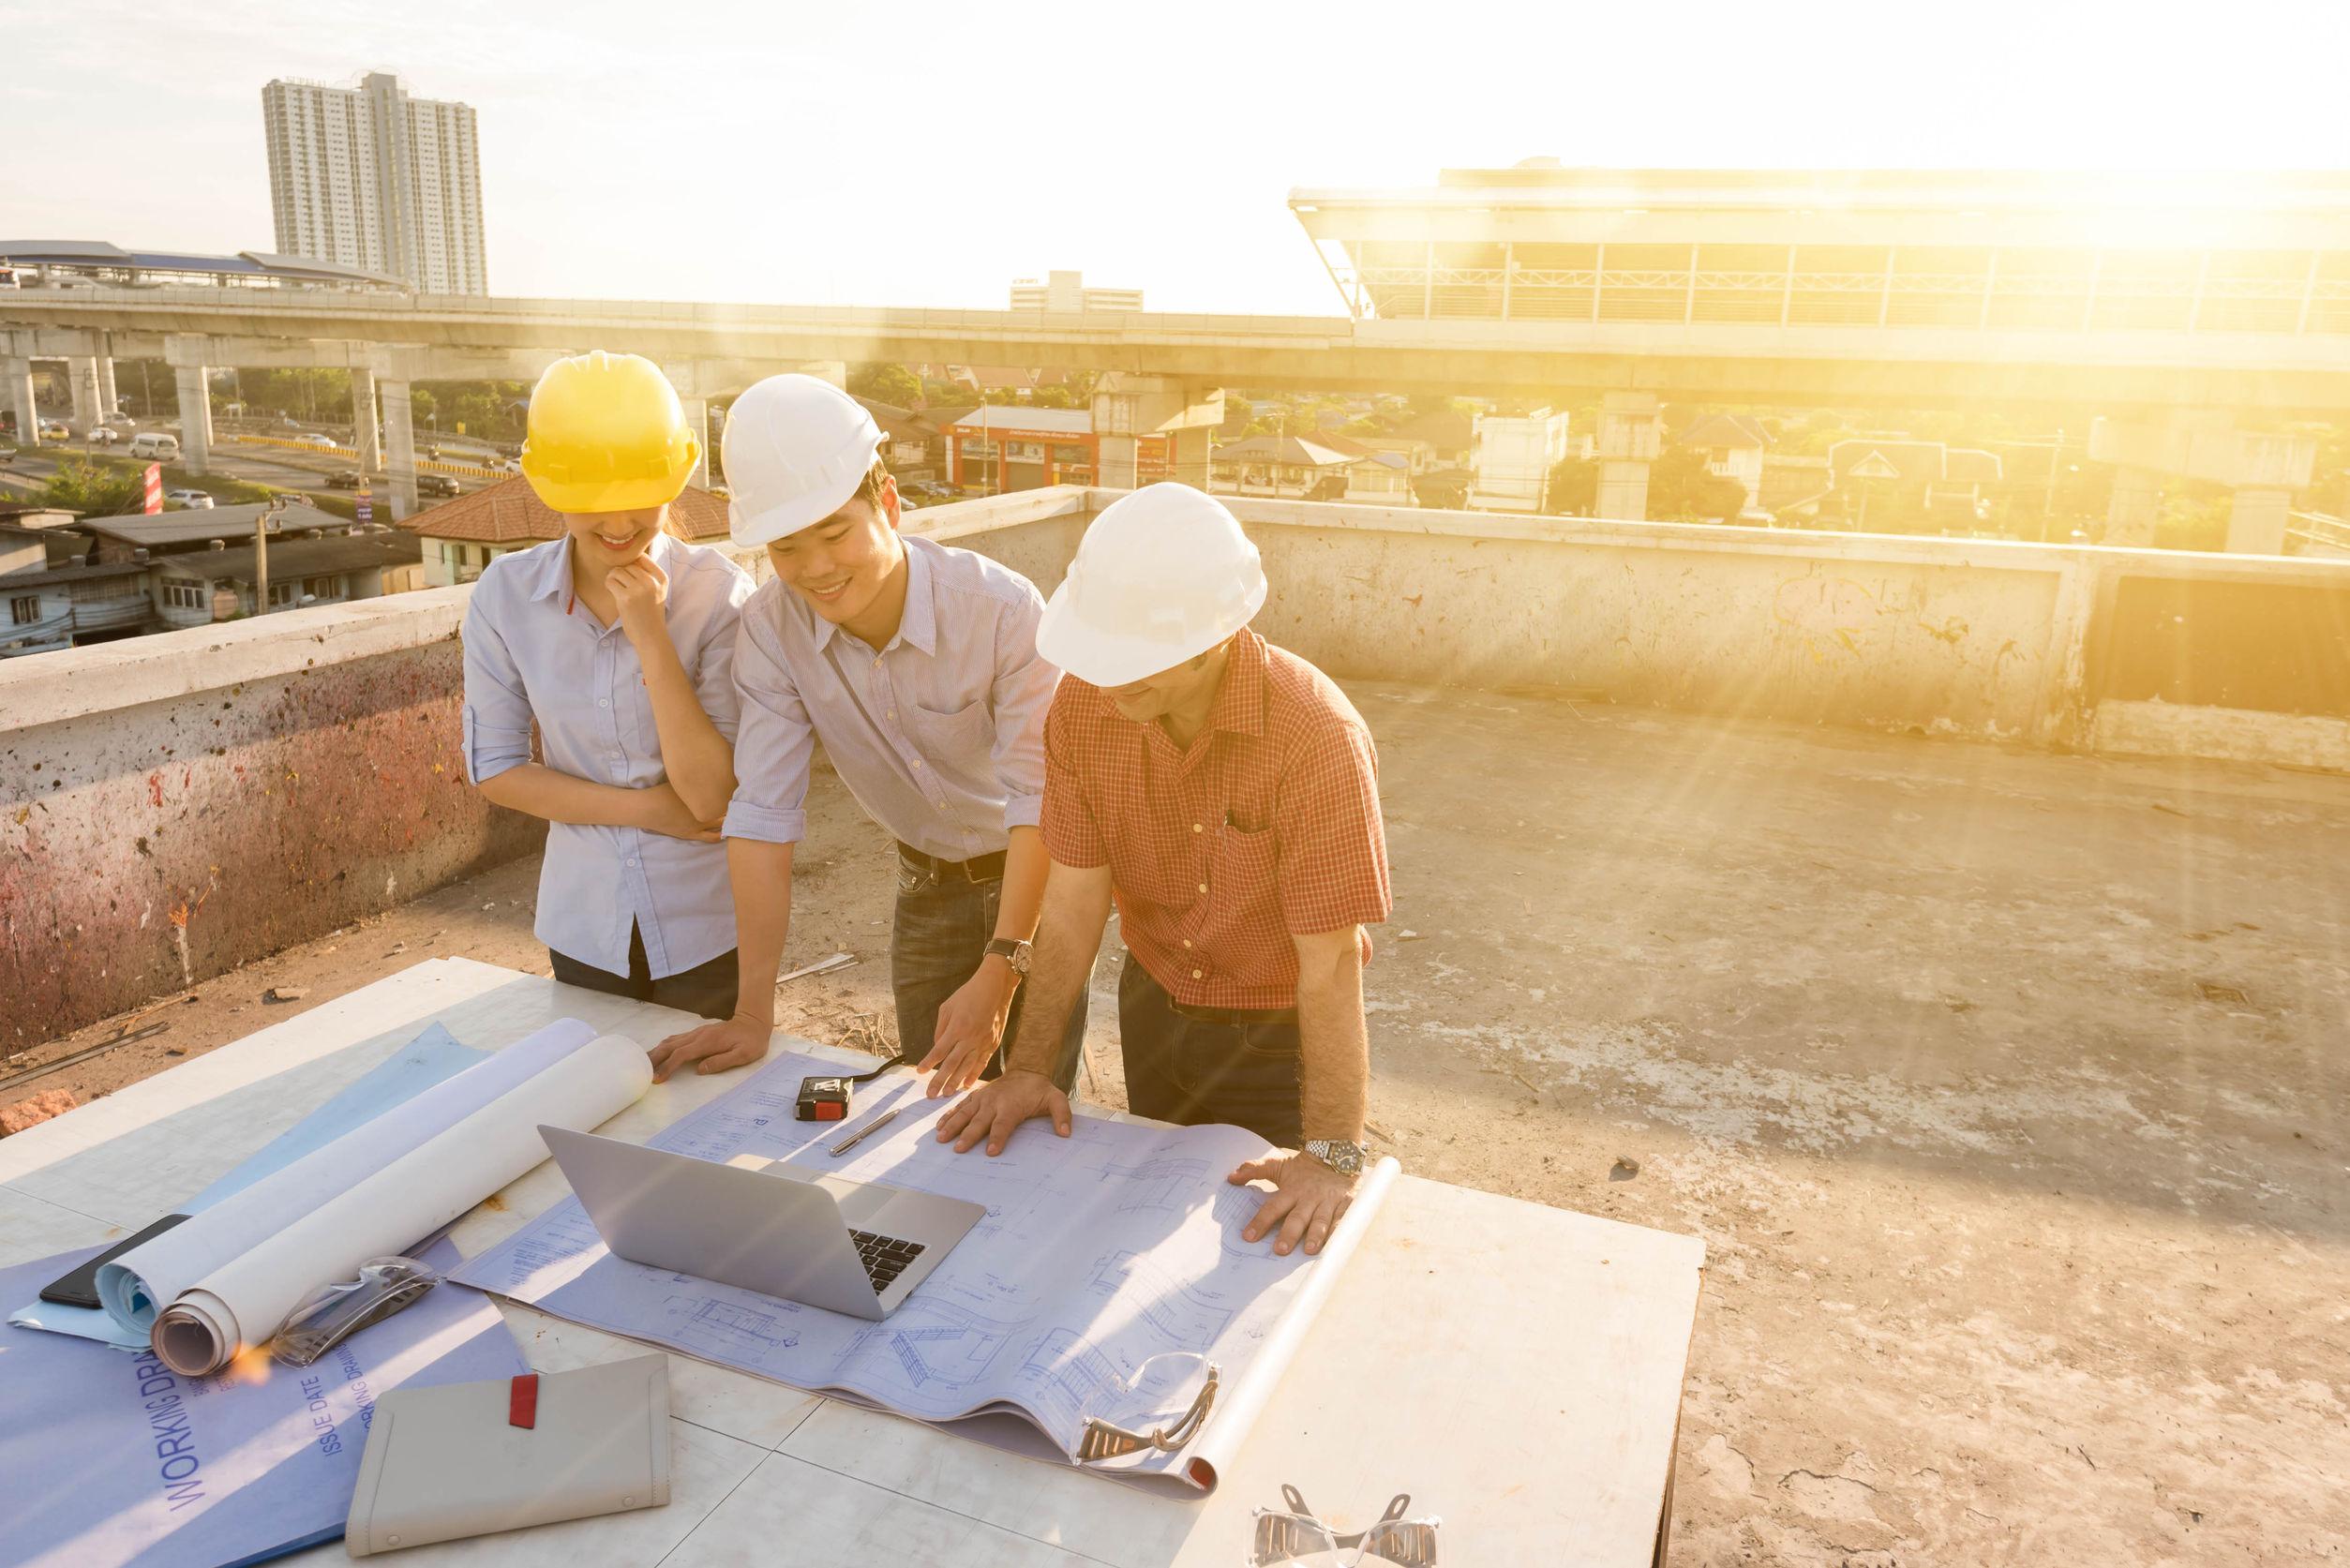 sunny-rooftop-construction.jpg#asset:14038